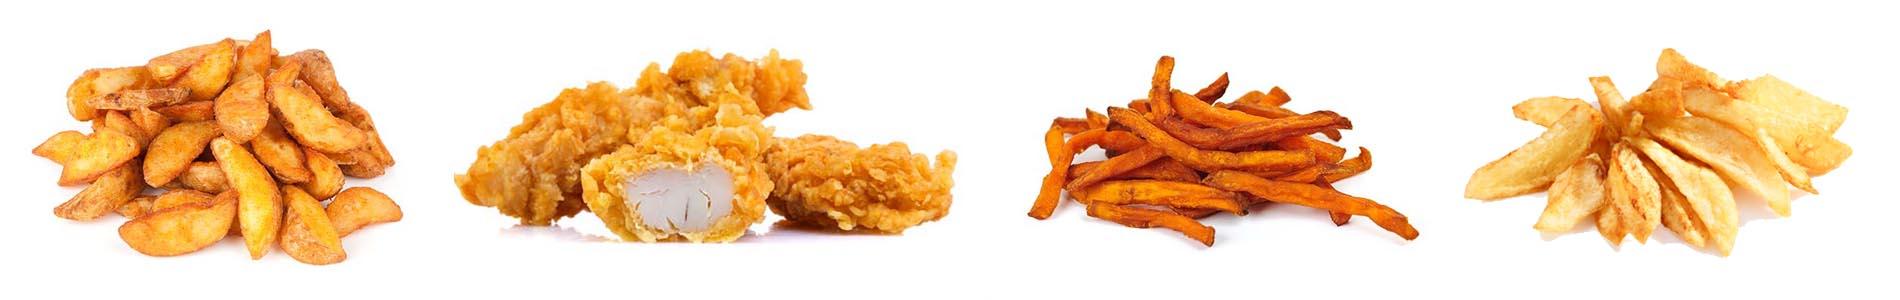 Finger-food-Burger-buben